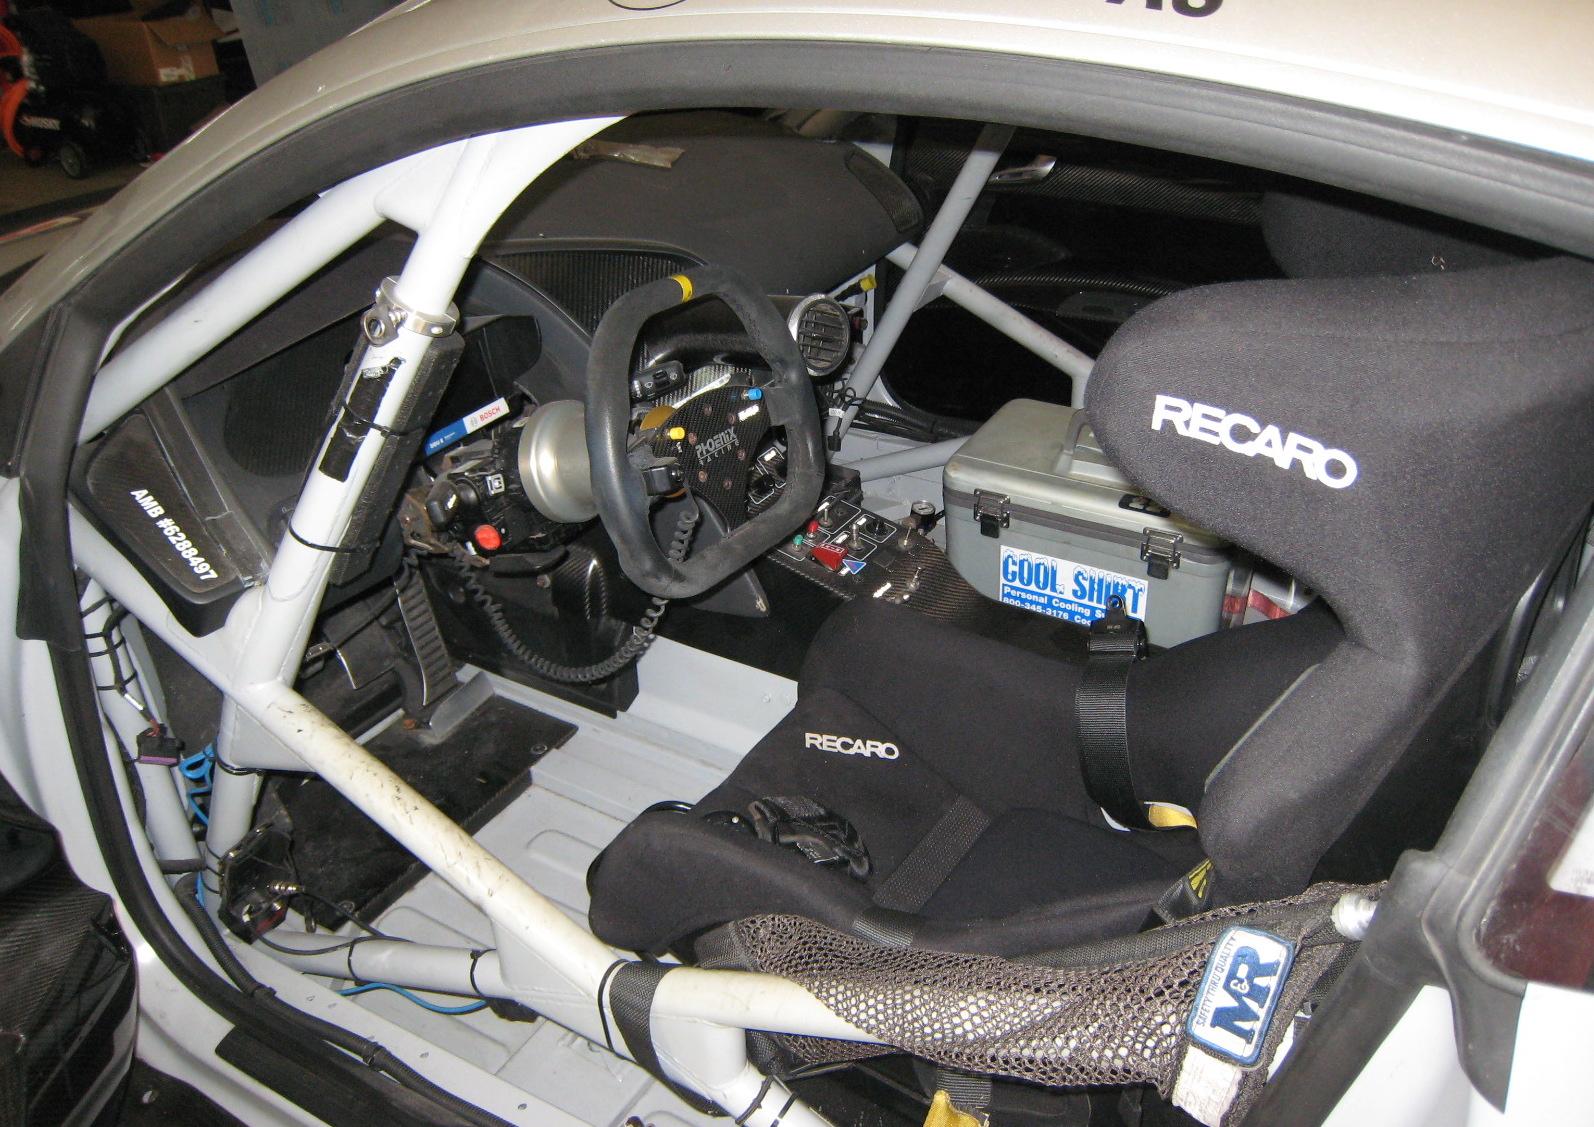 2010 audi r8 lms gt3 race car exotic car list. Black Bedroom Furniture Sets. Home Design Ideas